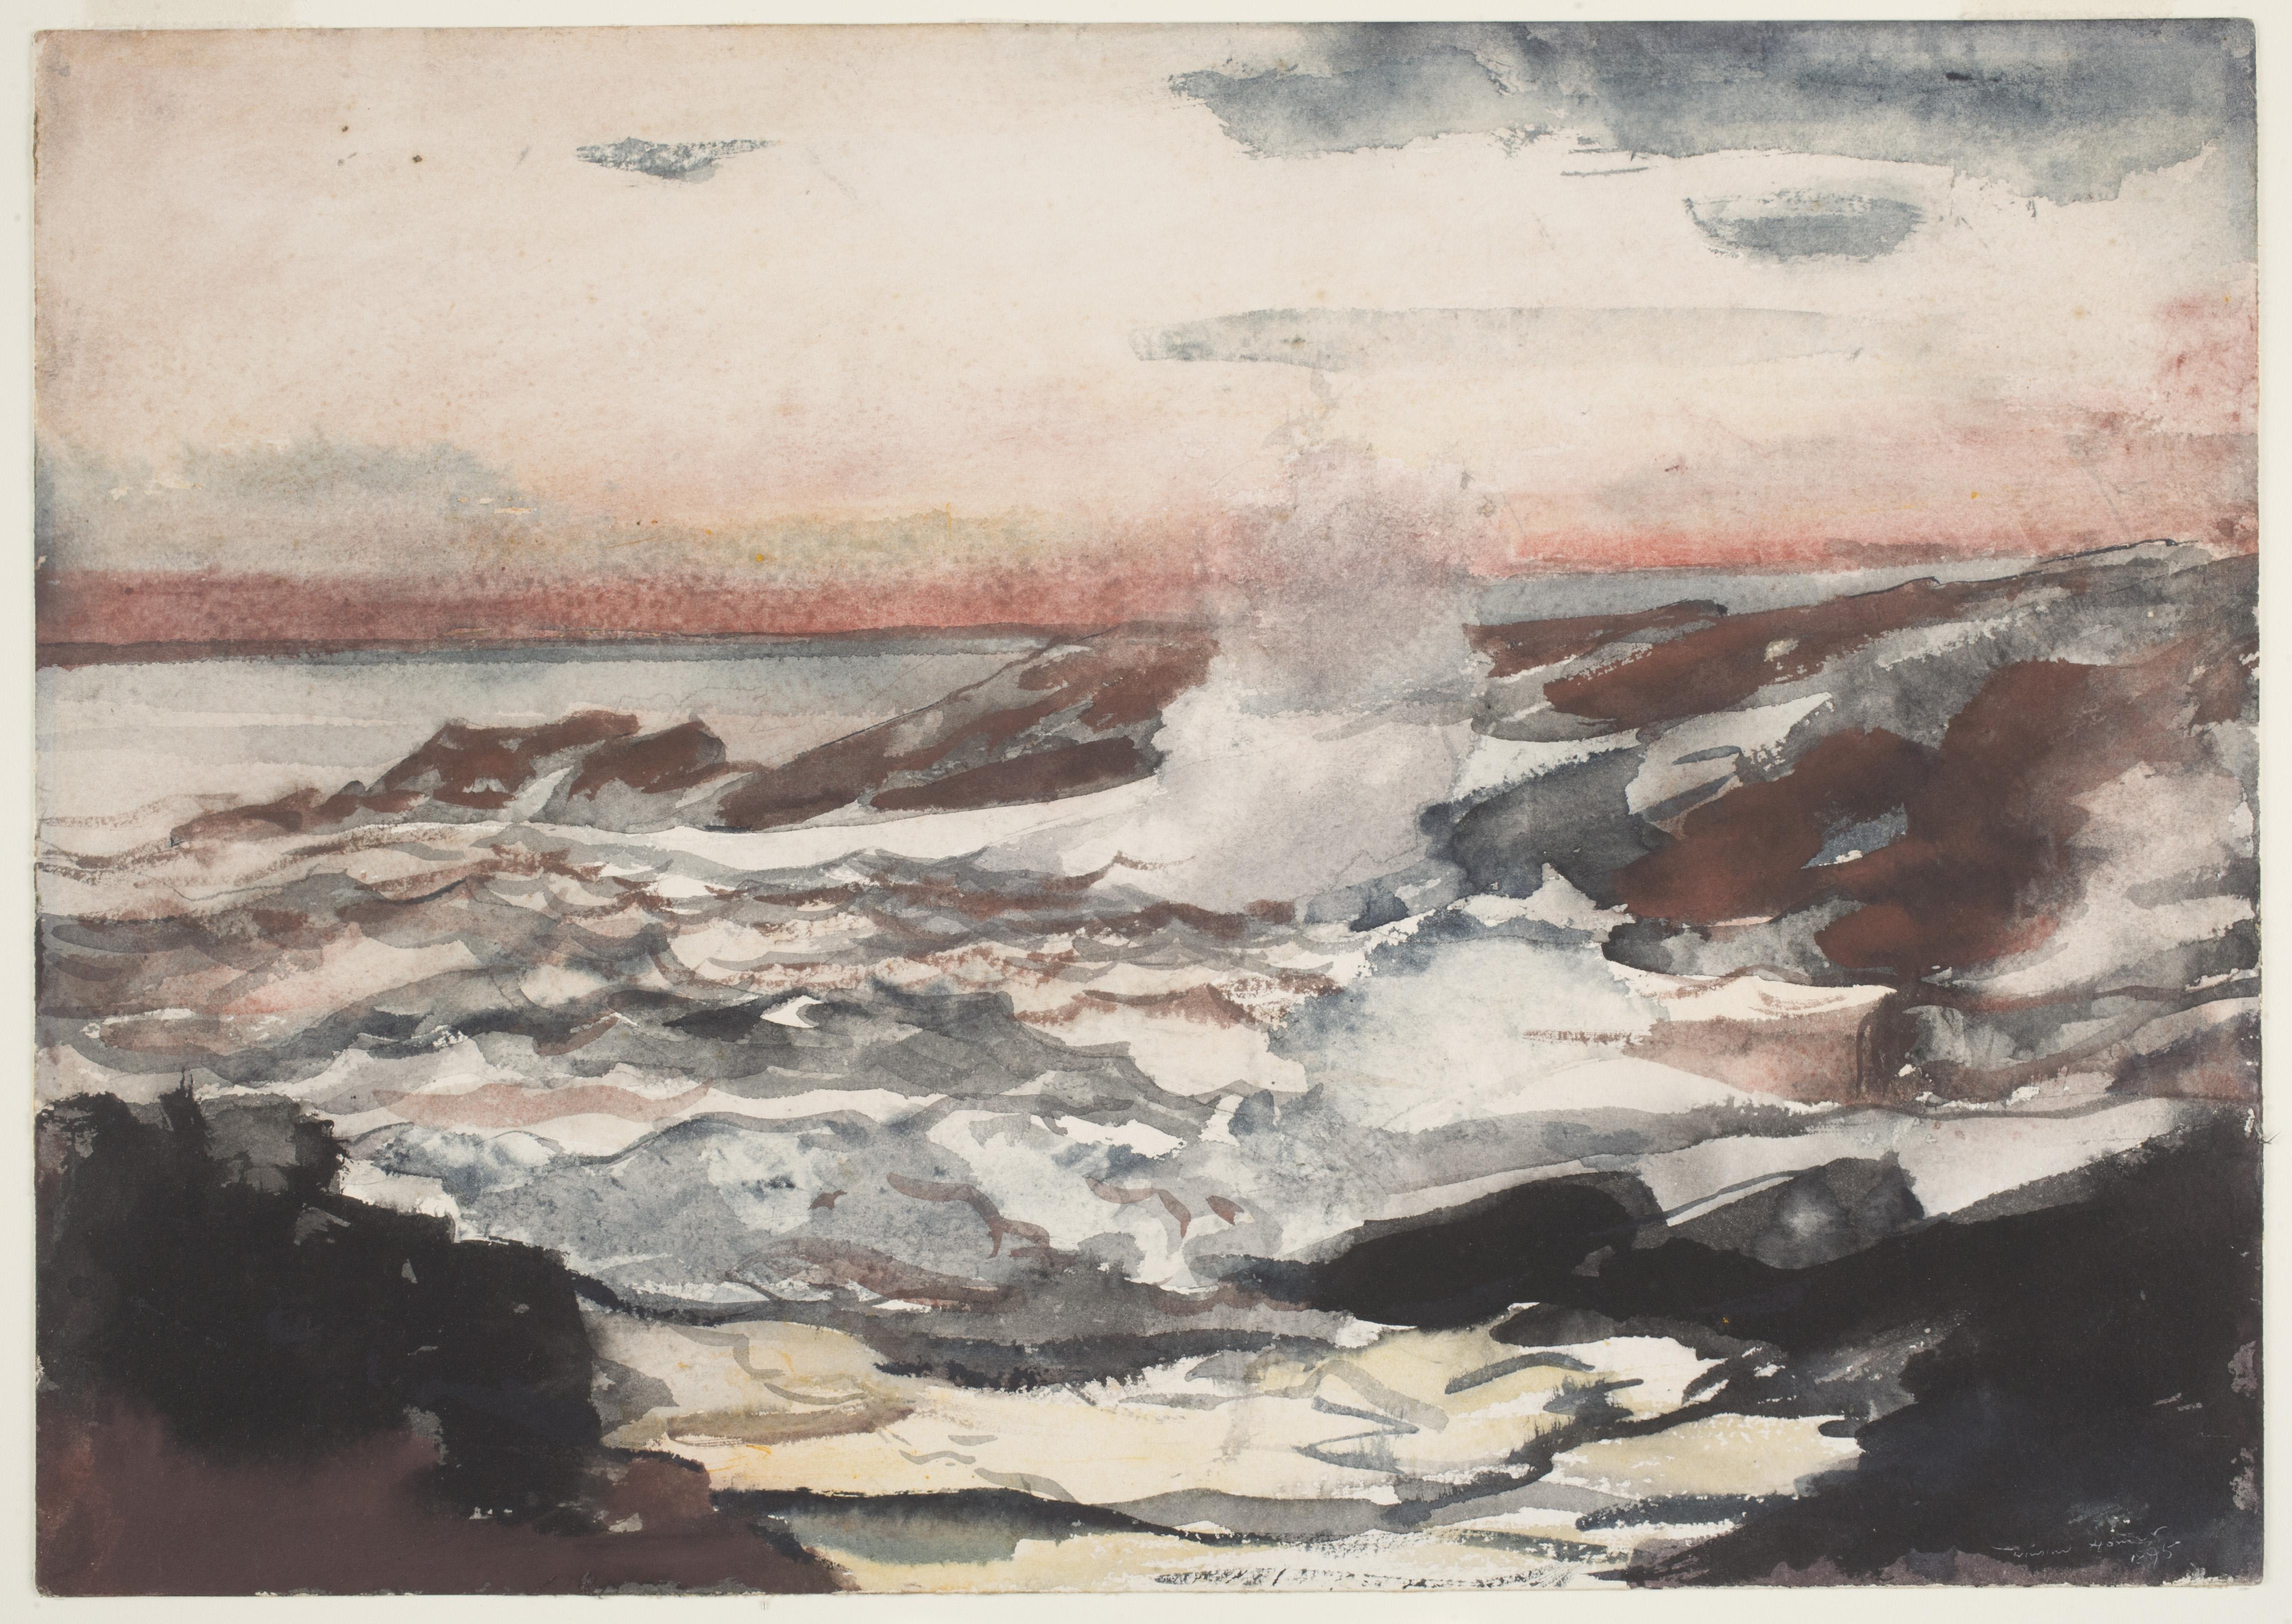 Coming Away Winslow Homer And England Worcester Art Museum